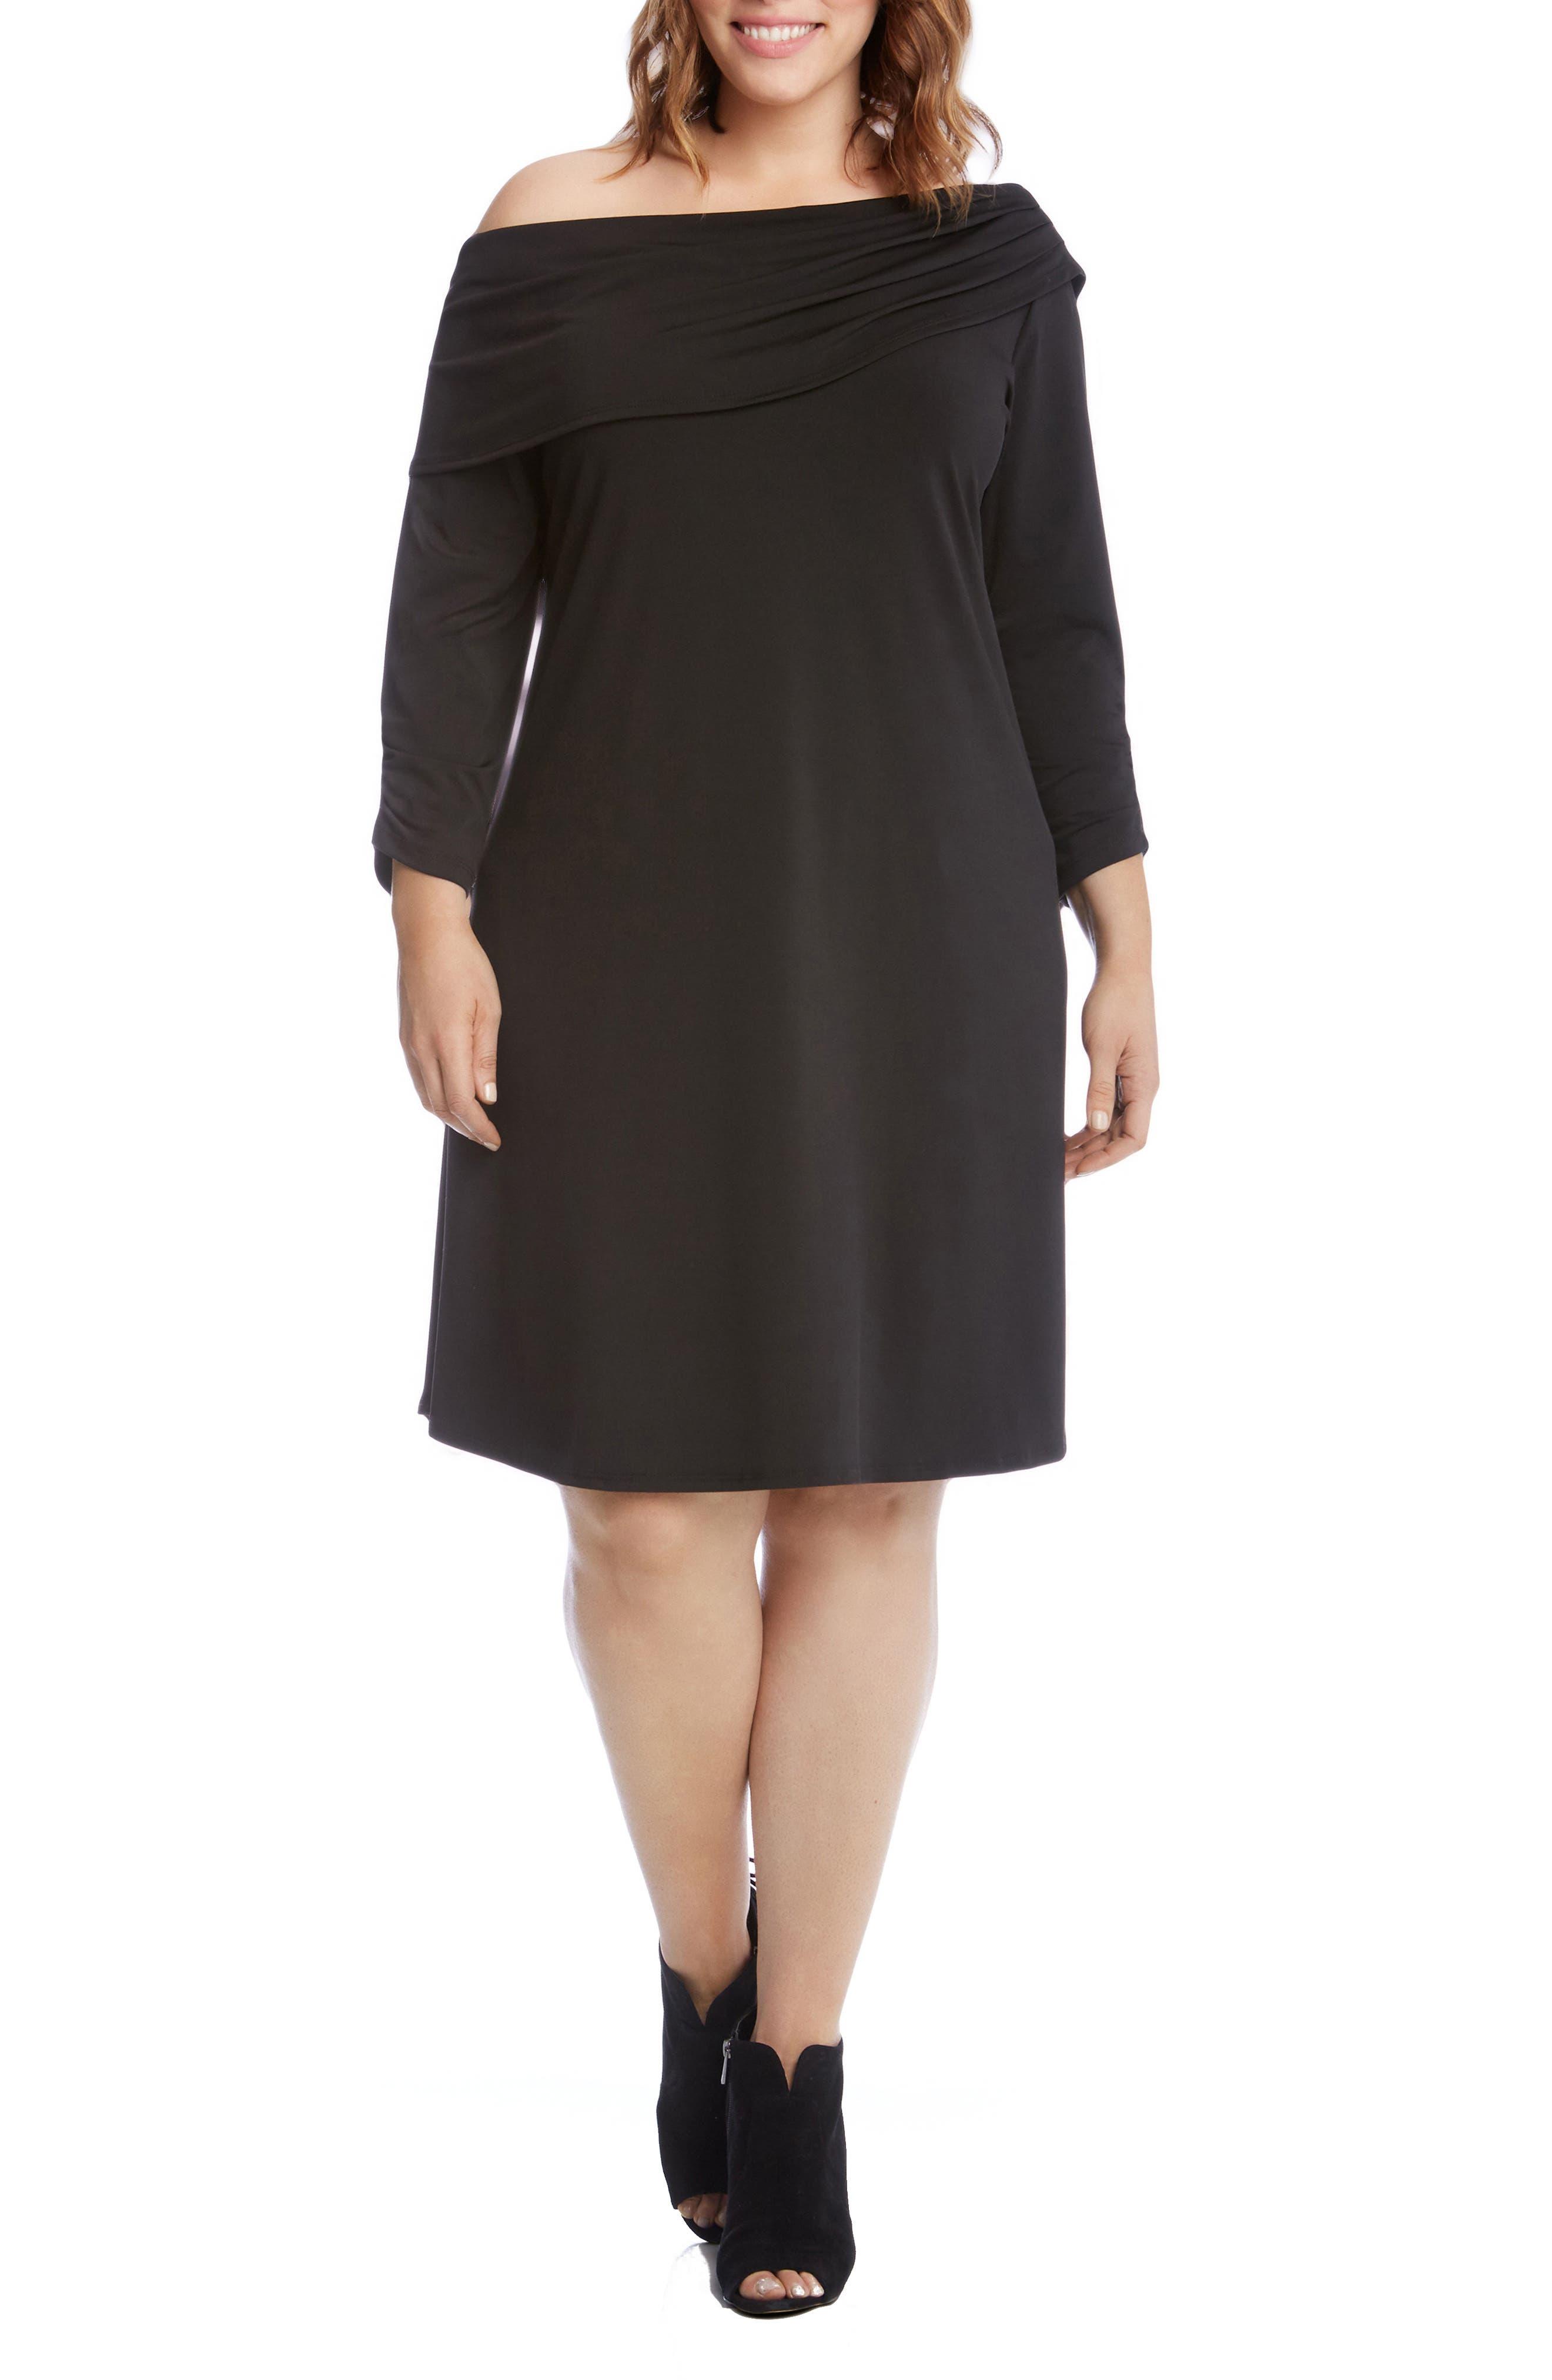 Alternate Image 1 Selected - Karen Kane Draped Boat Neck Dress (Plus Size)